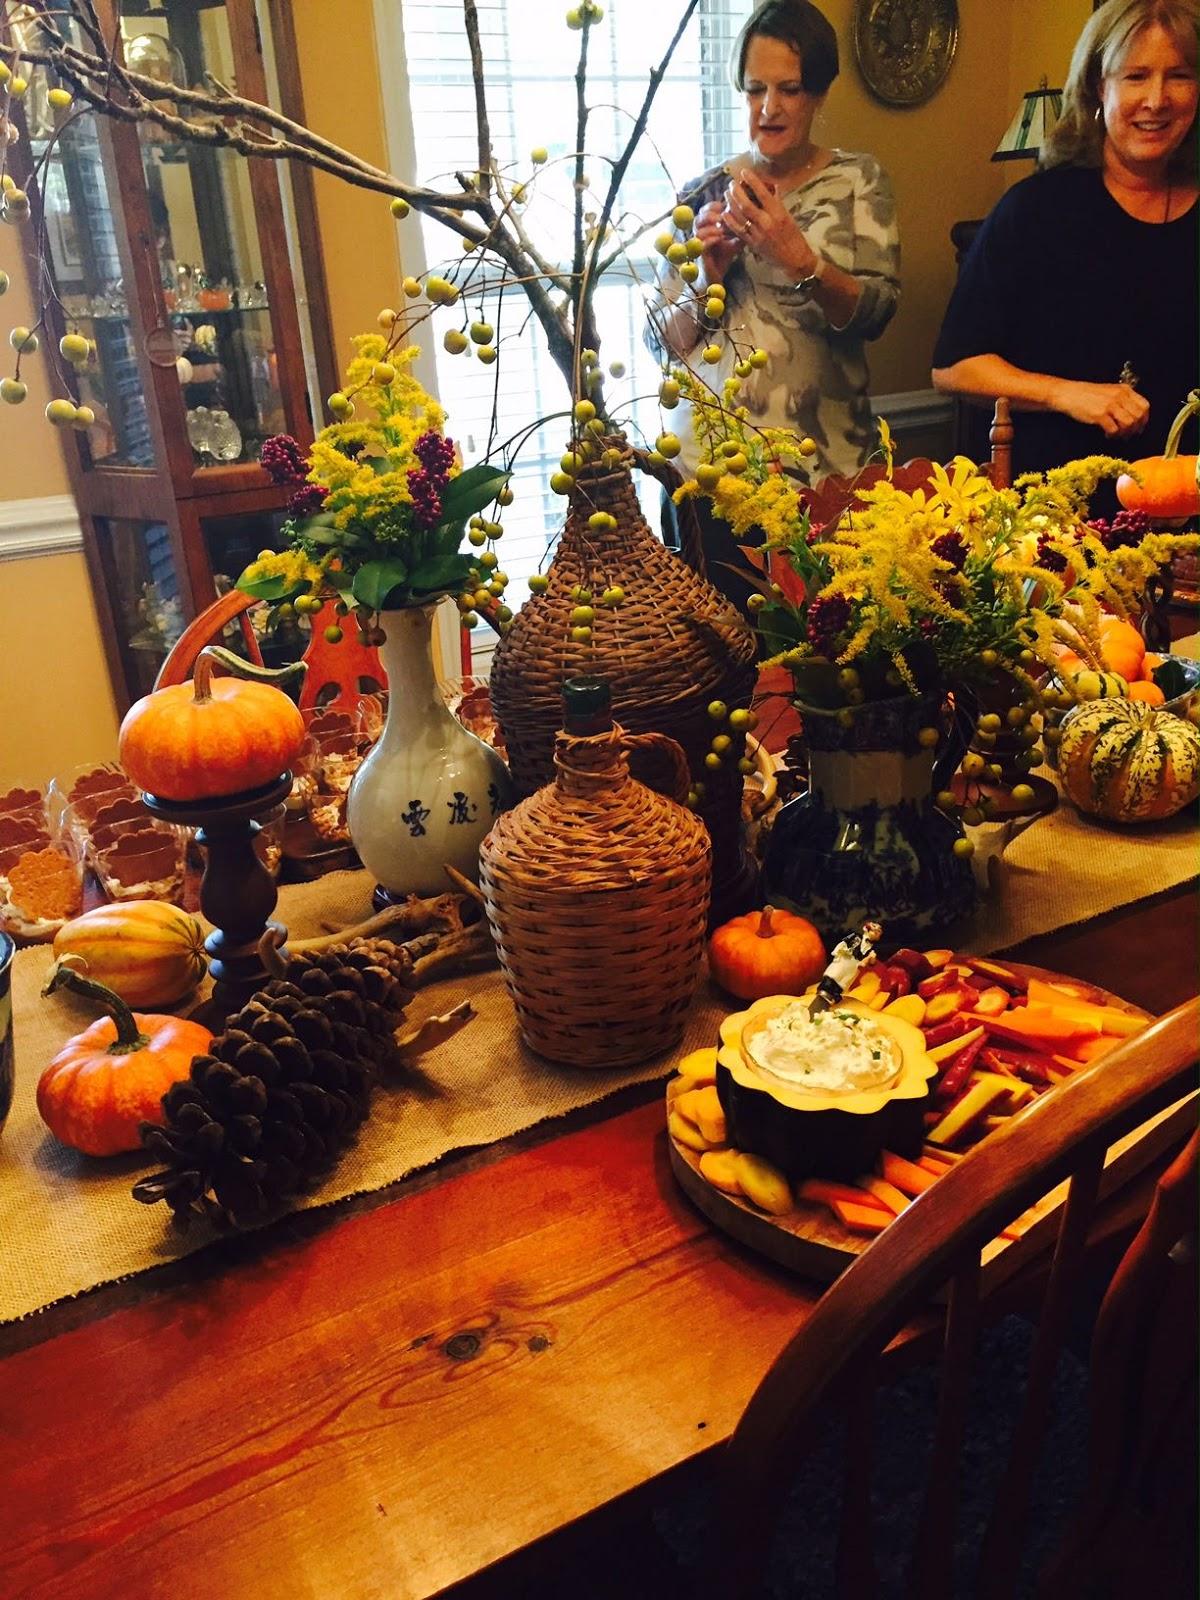 September Decorating Ideas september 2016 - living with thanksgiving